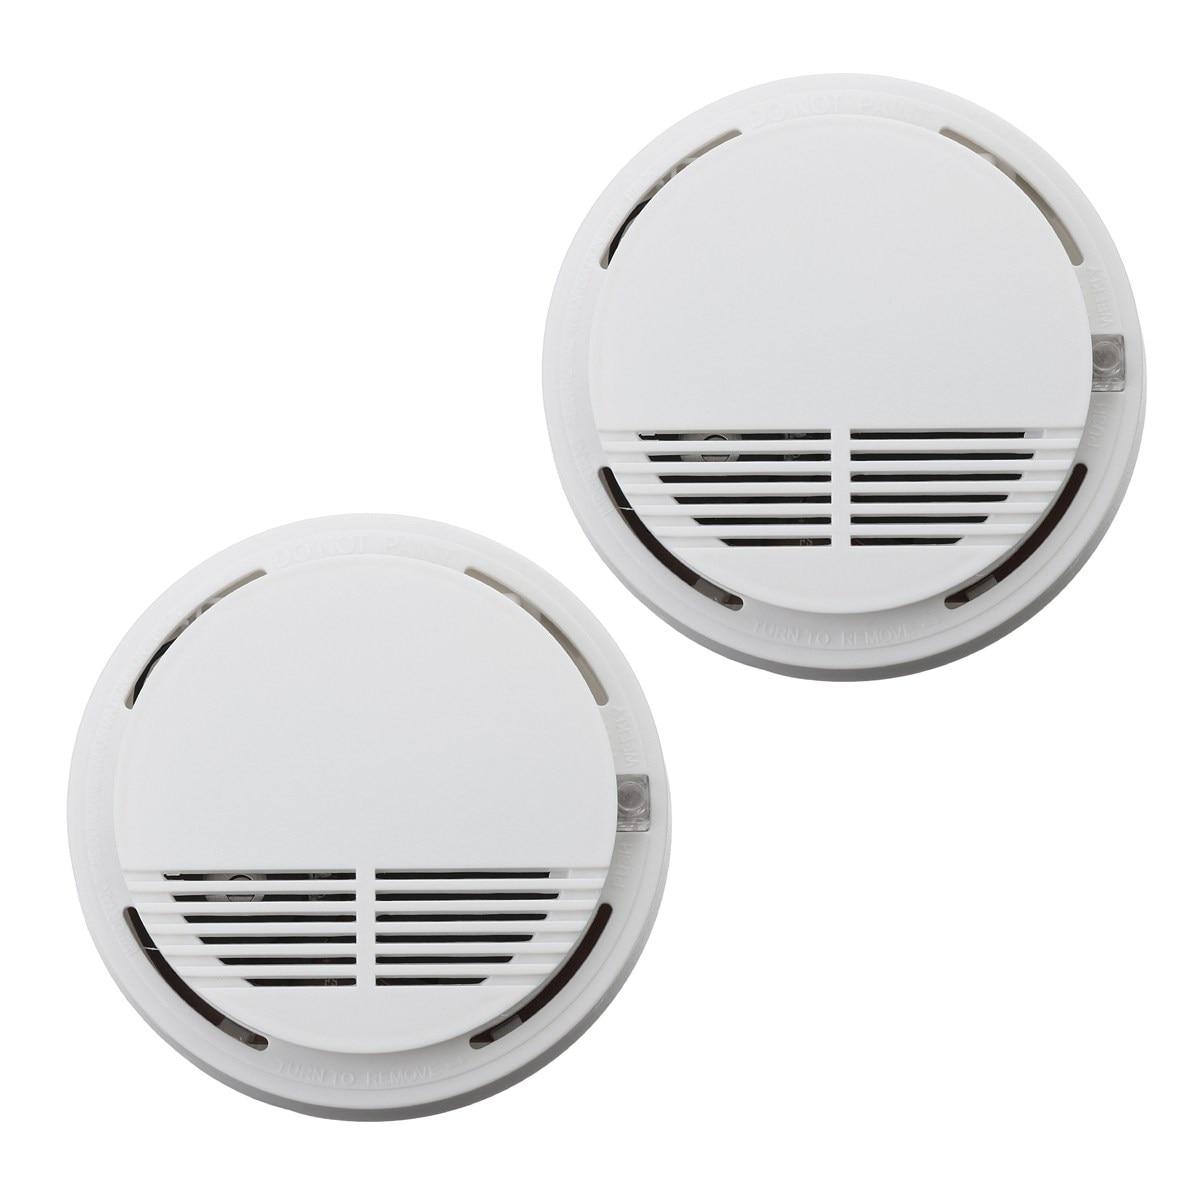 NEW Safurance 2Pcs Home Security Photoelectric Cordless Smoke Detector Fire Sensor Alarm White High Sensitive hot home security photoelectric cordless smoke detector fire sensor alarm white